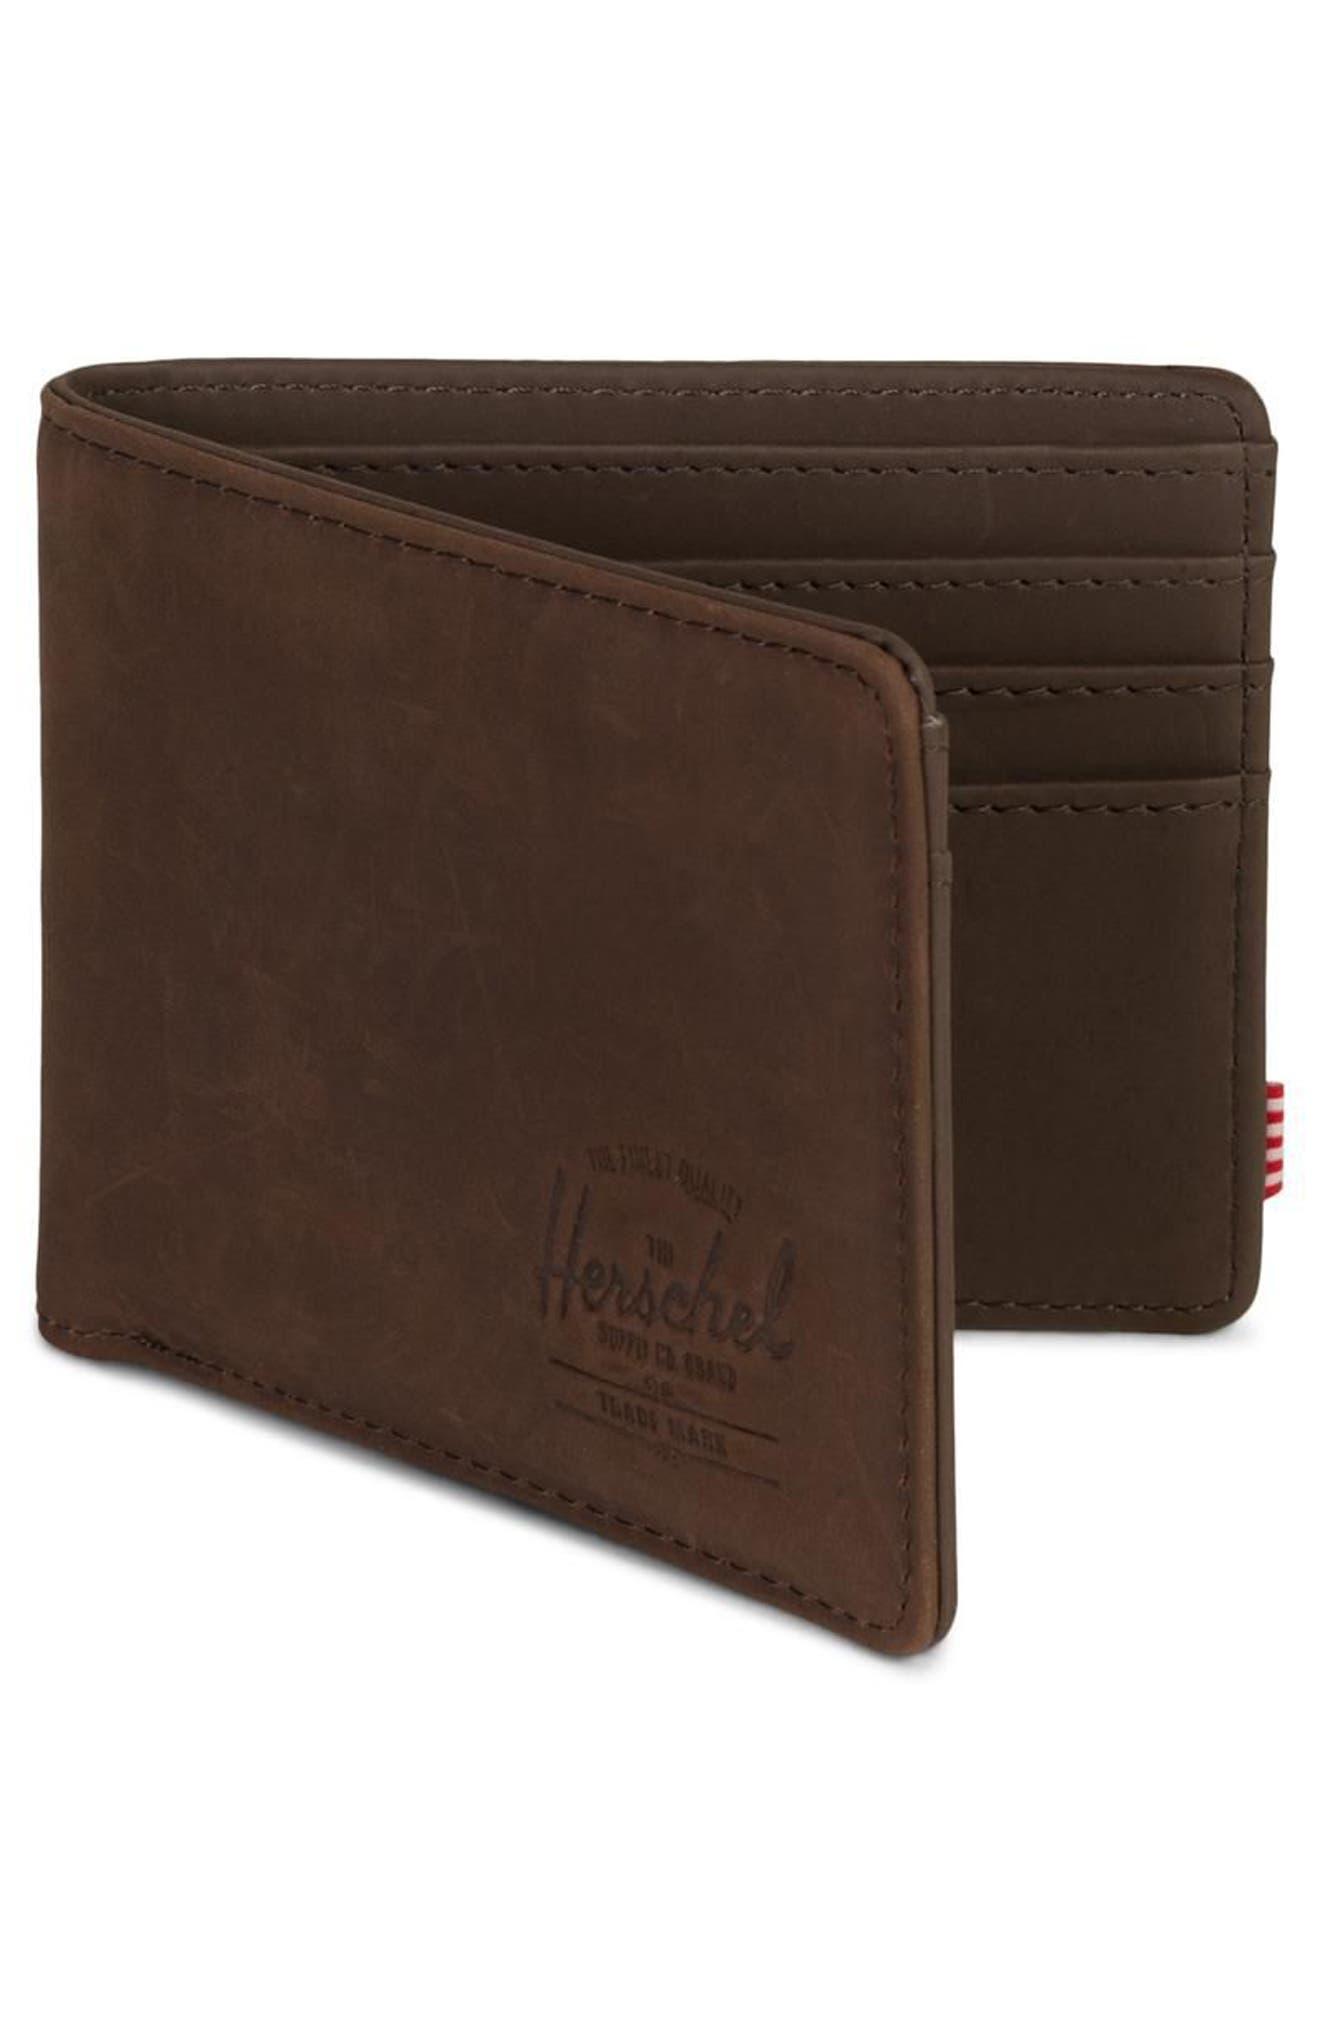 Hank Leather Wallet,                             Alternate thumbnail 2, color,                             Nubuck Brown